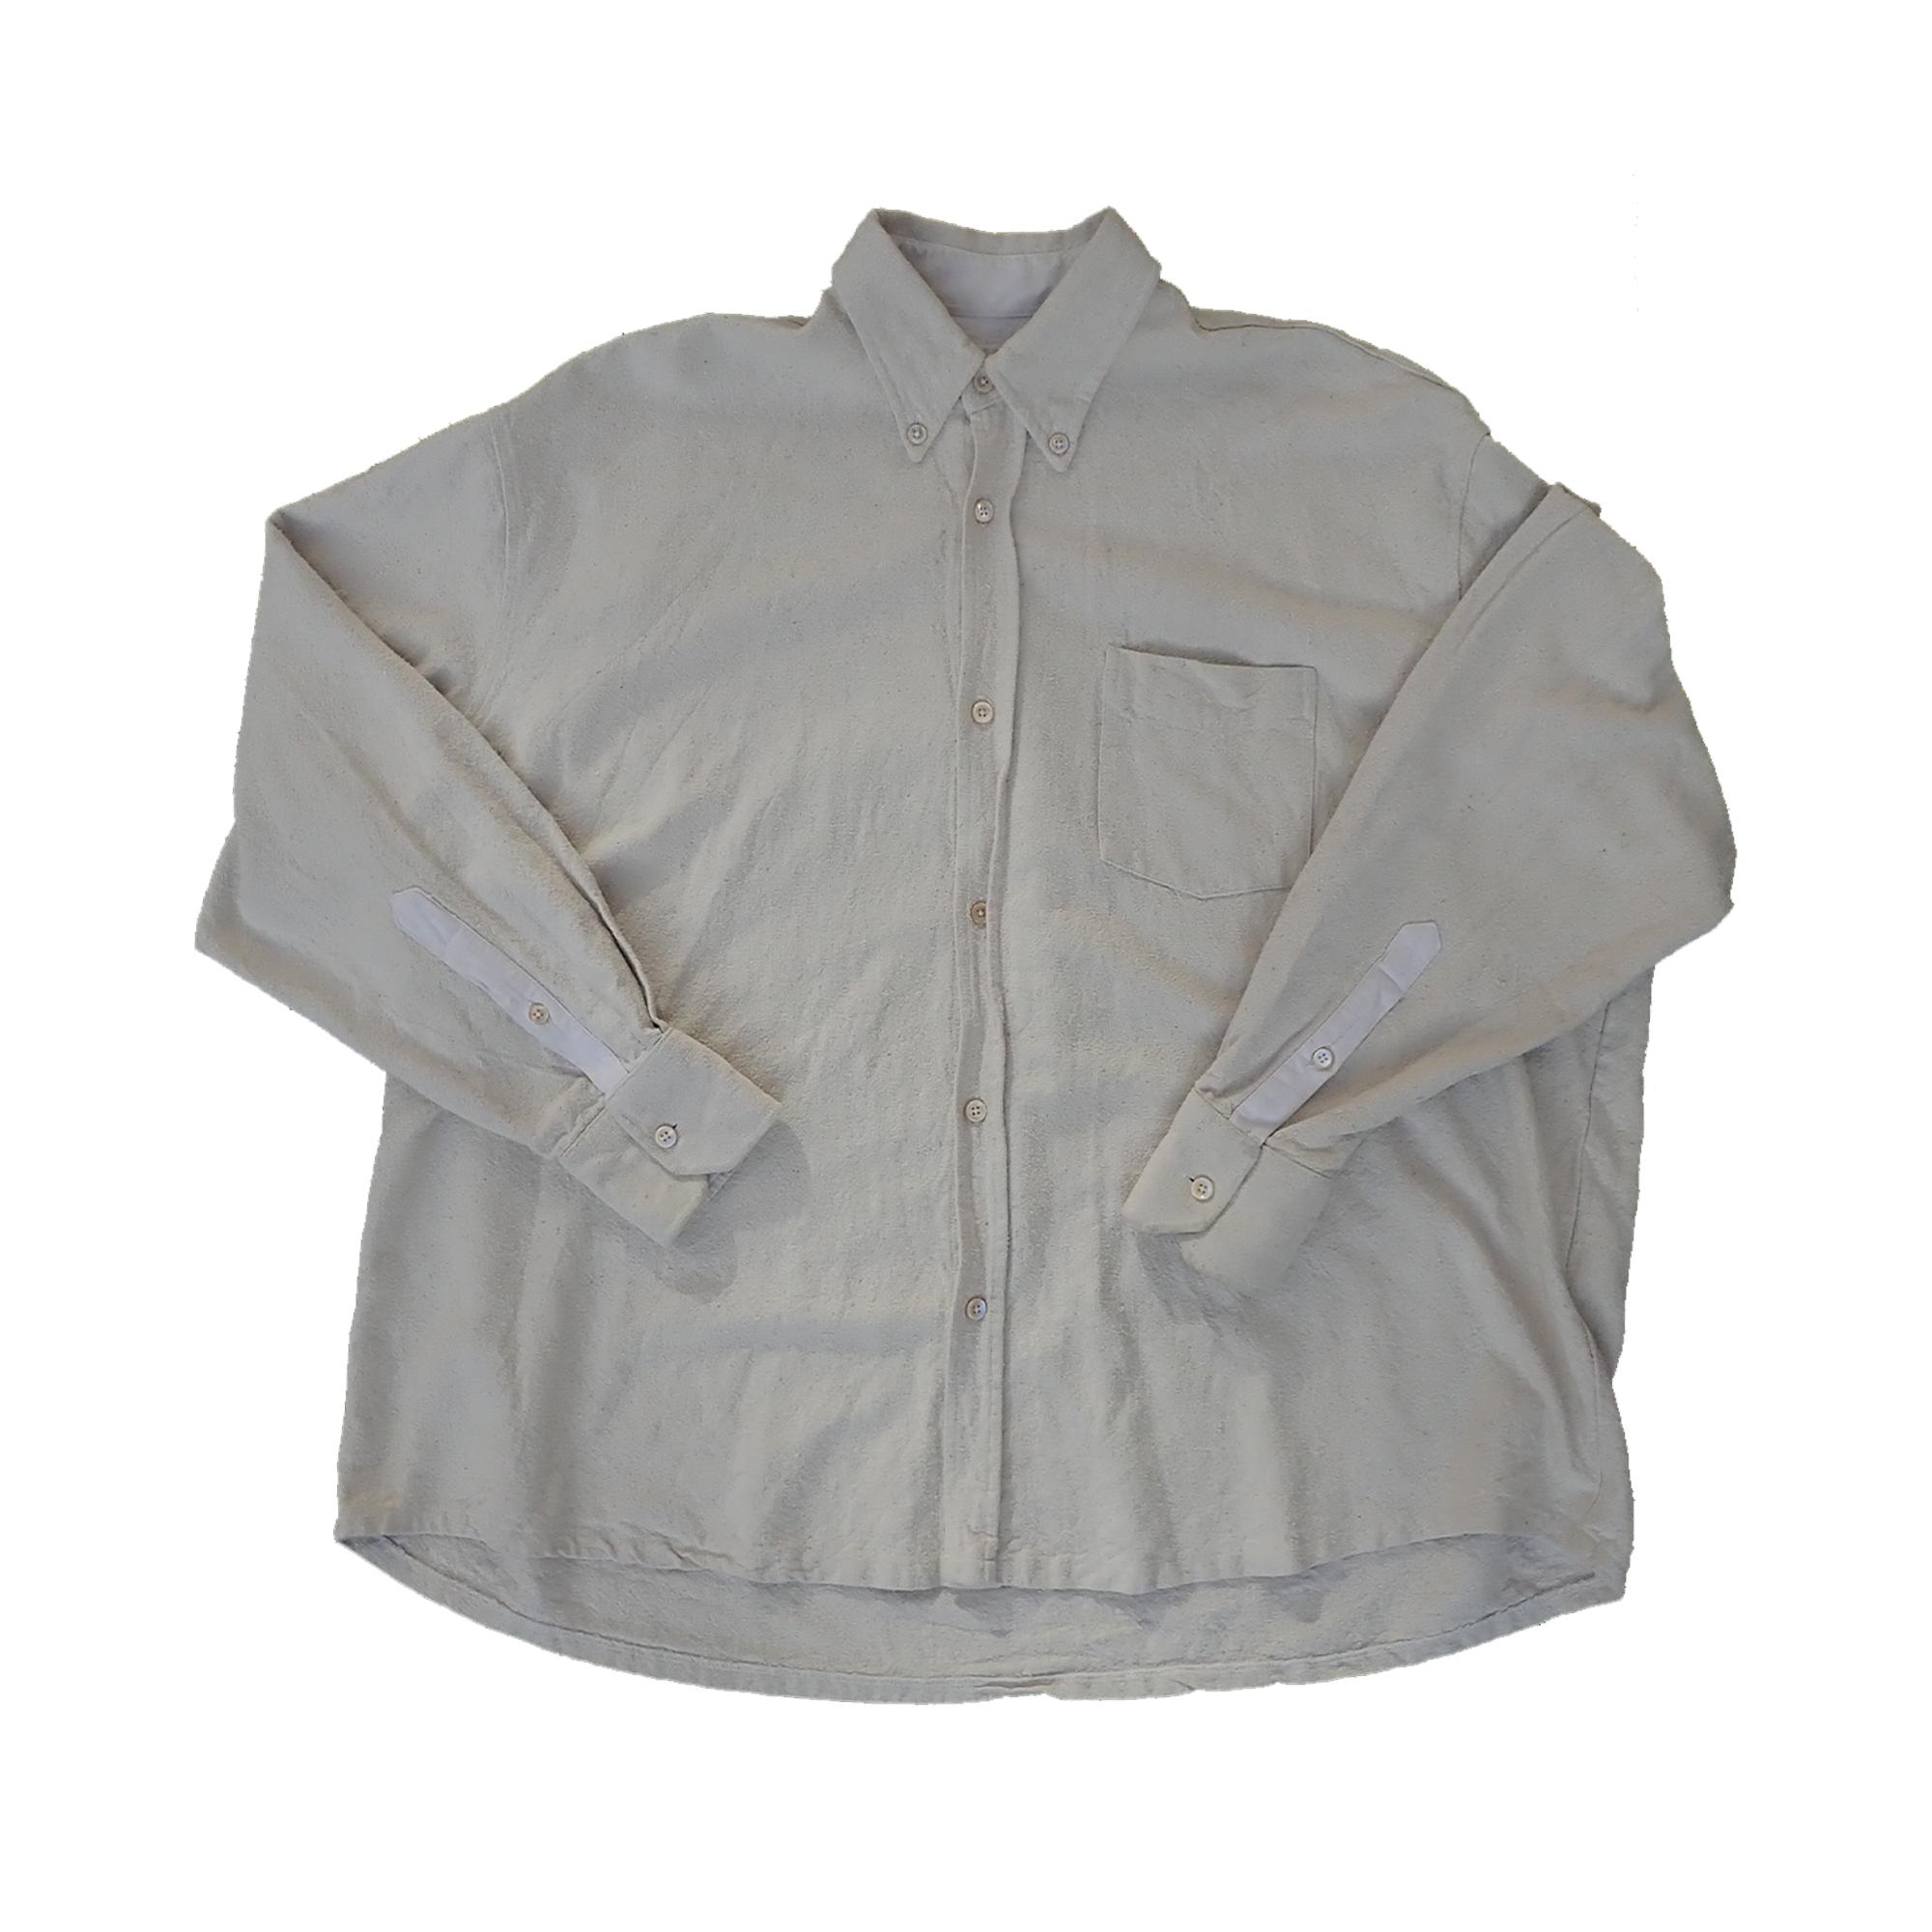 Our Legacy Borrowed BD Button Shirt